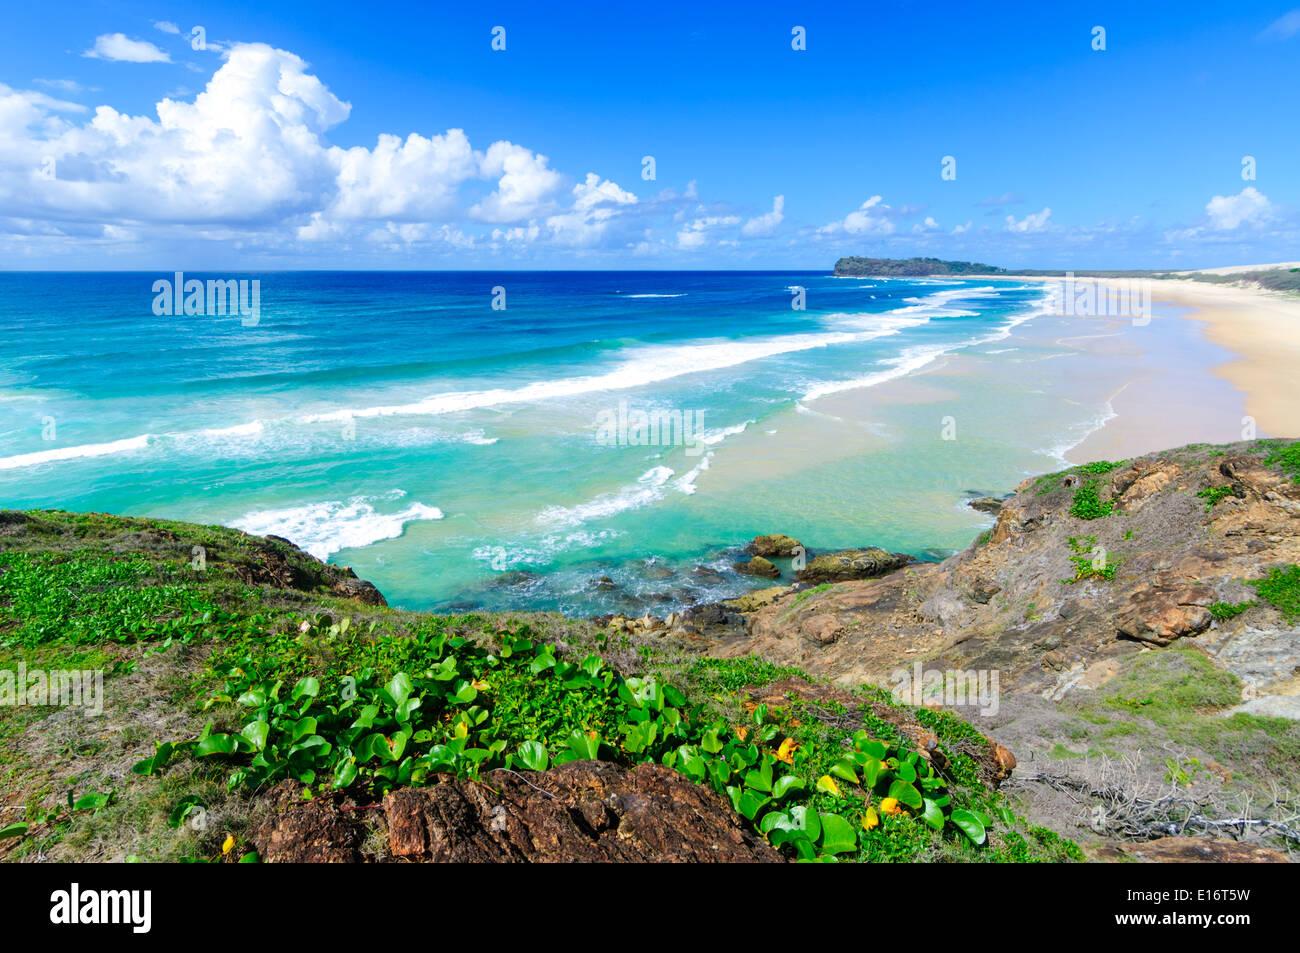 fraser-island-queensland-qld-australia-e